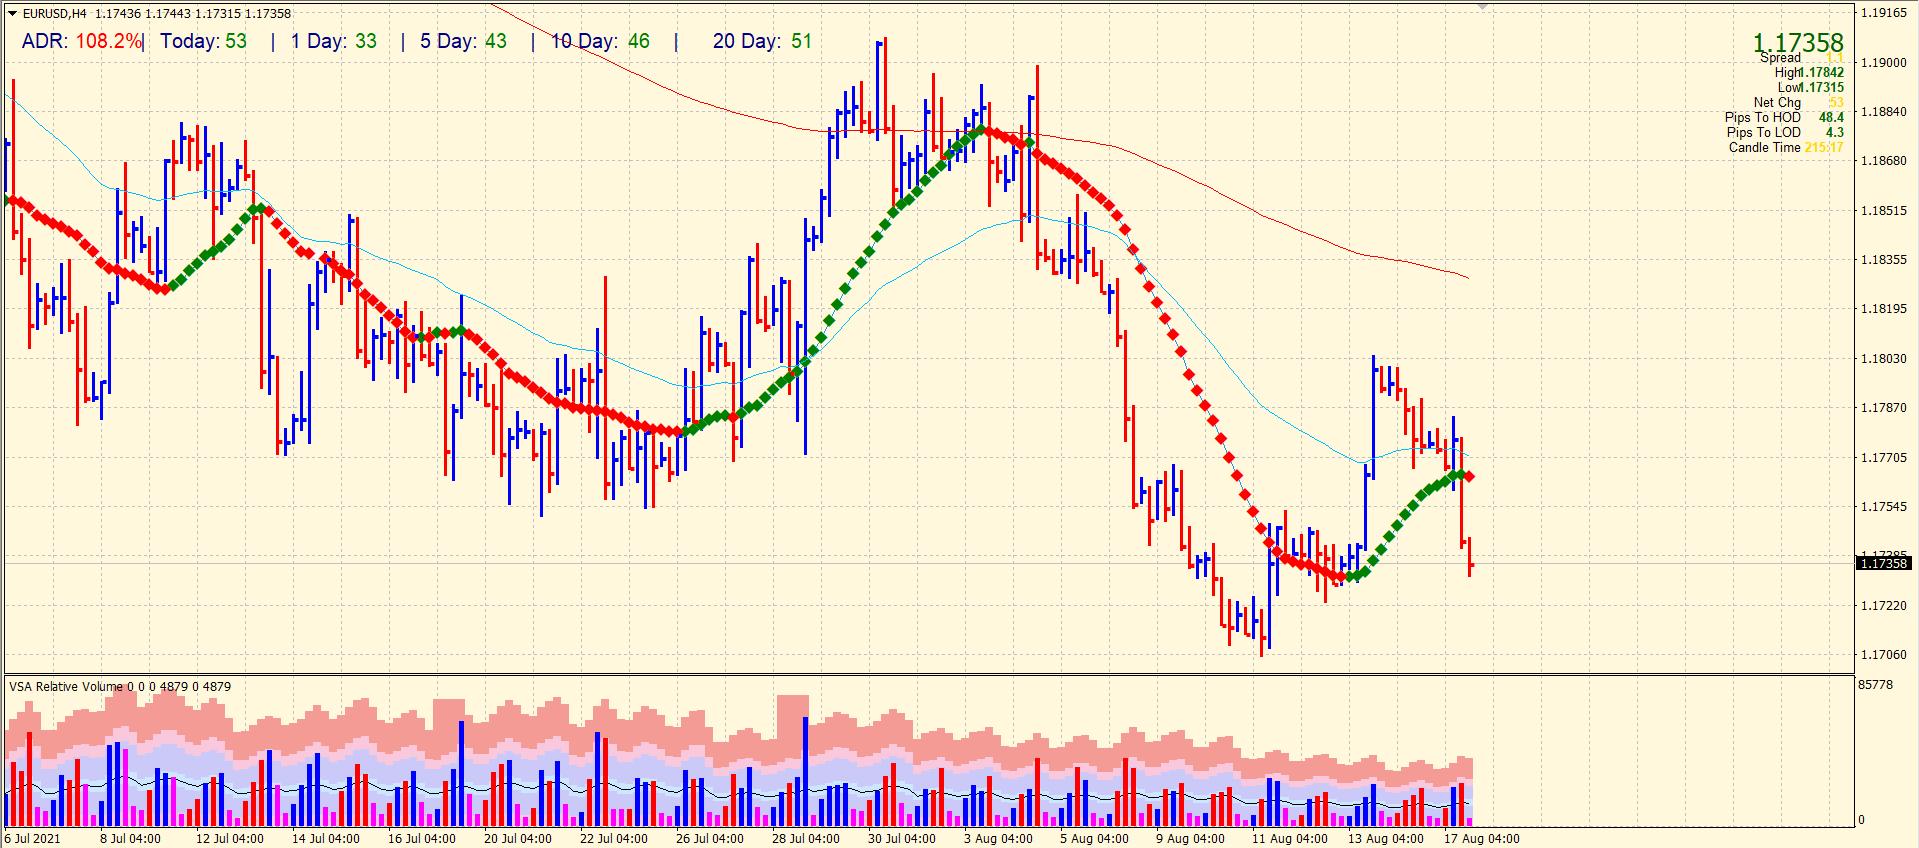 EUR/USD 4-hour chart forecast